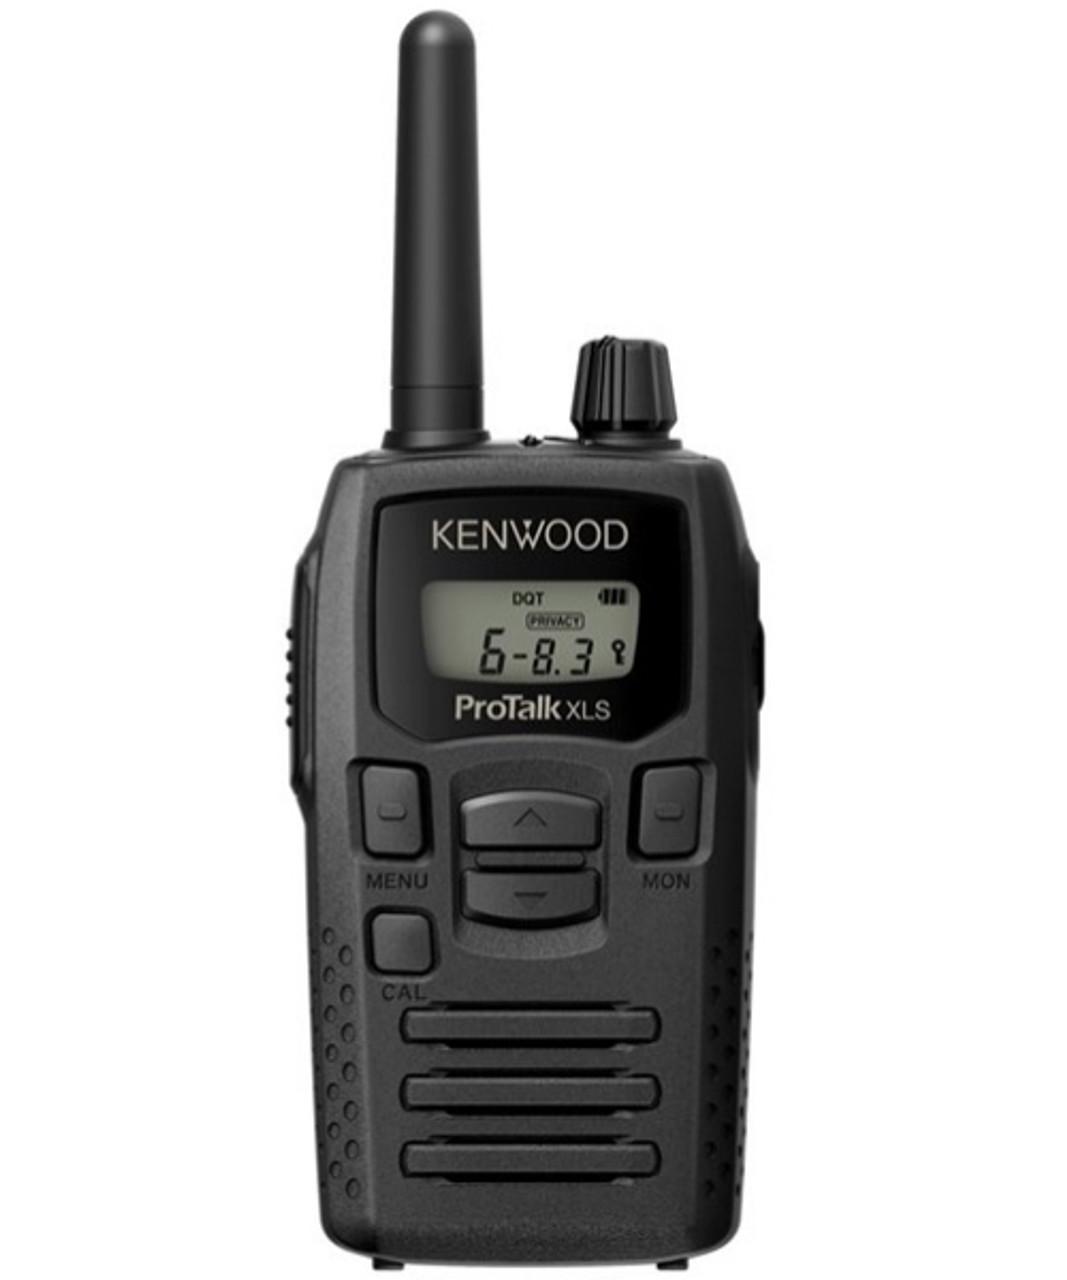 Kenwood ProTalk TK-3230DX UHF 6CH Two Way Radio